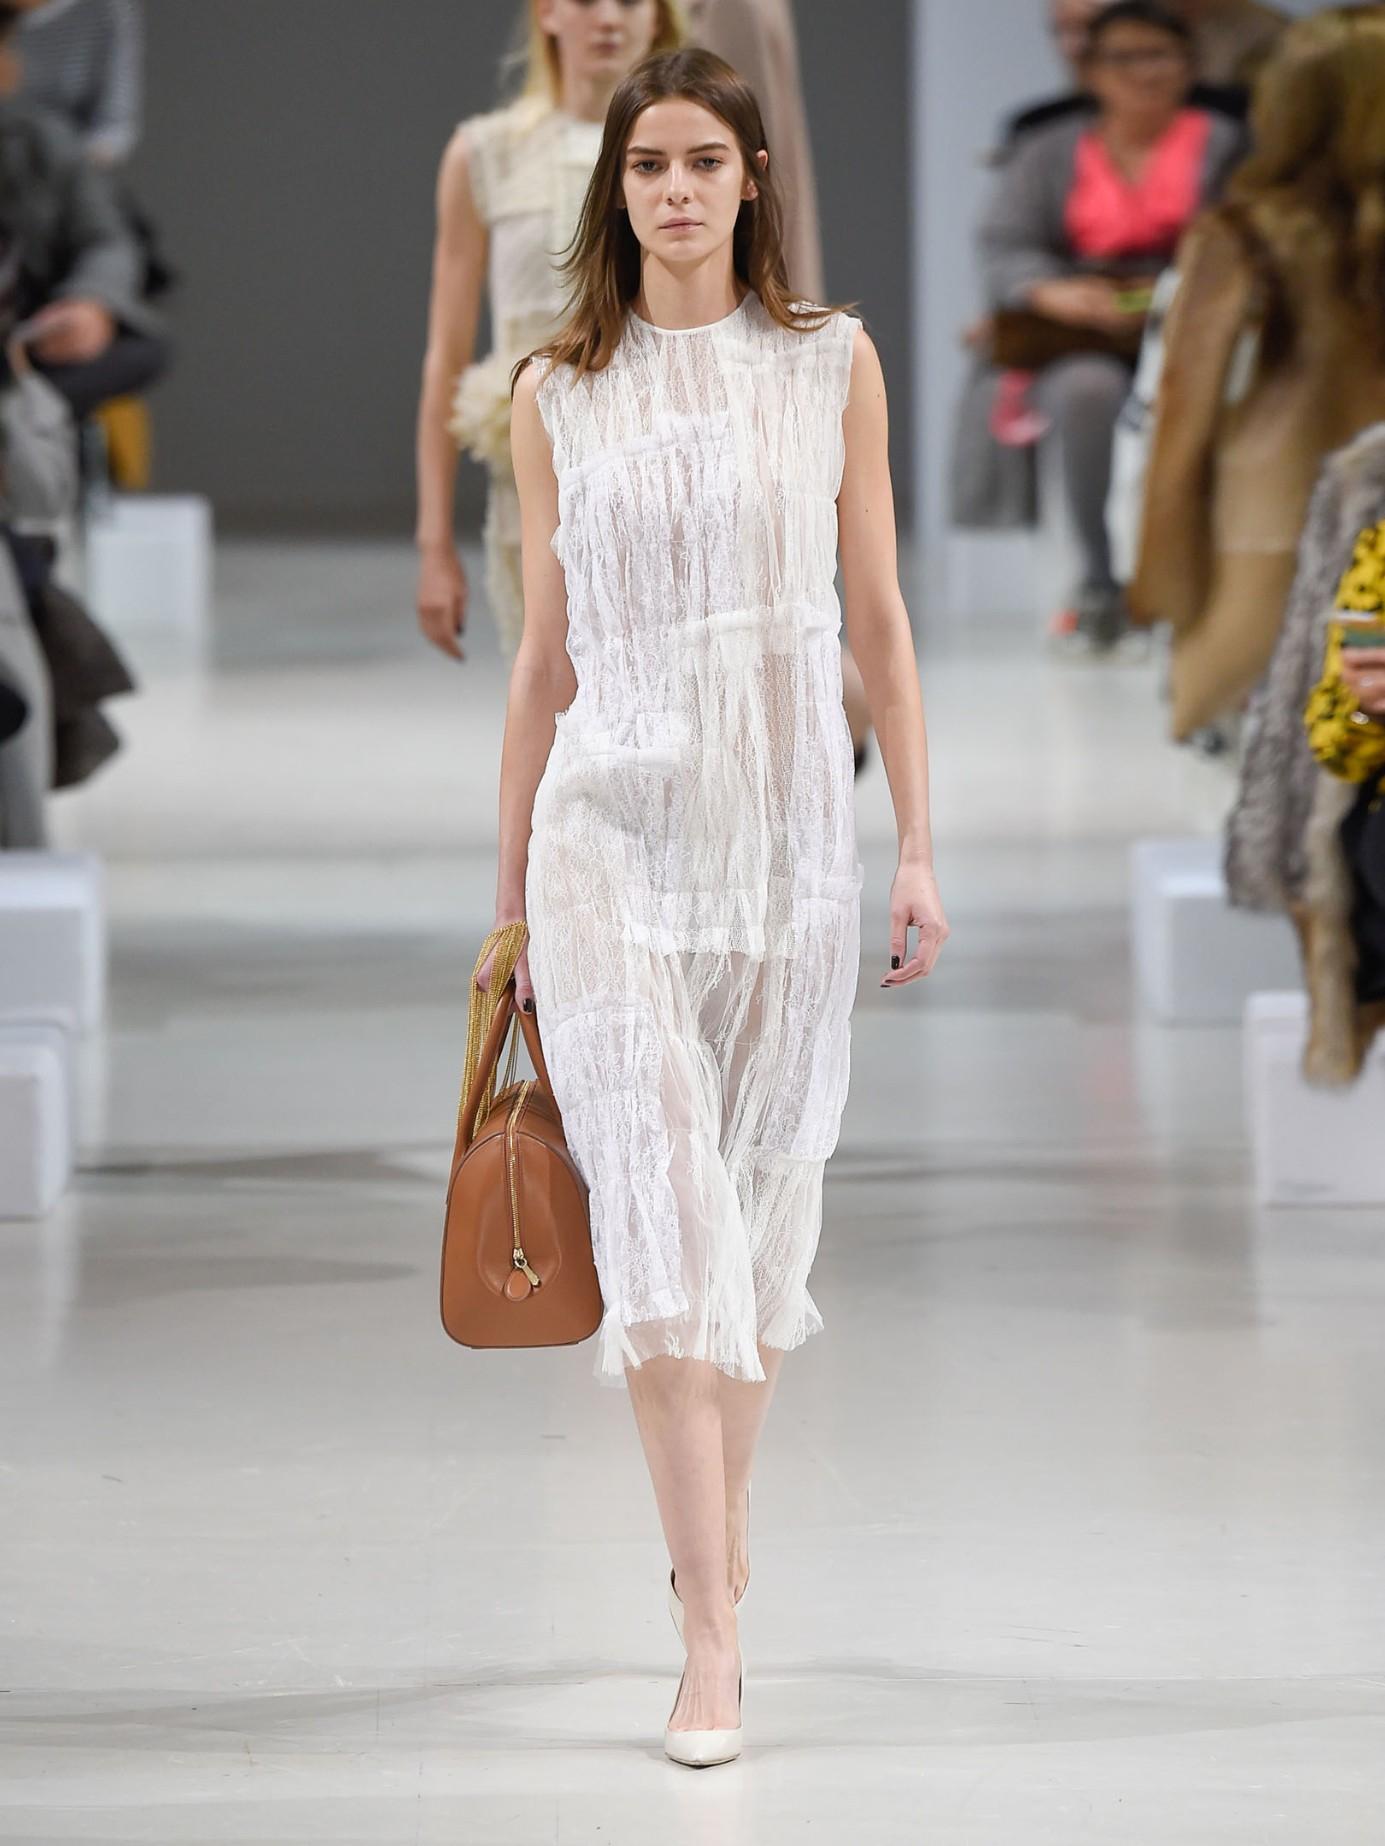 Lyst Nina Ricci Chantilly Lace Sleeveless Dress In White